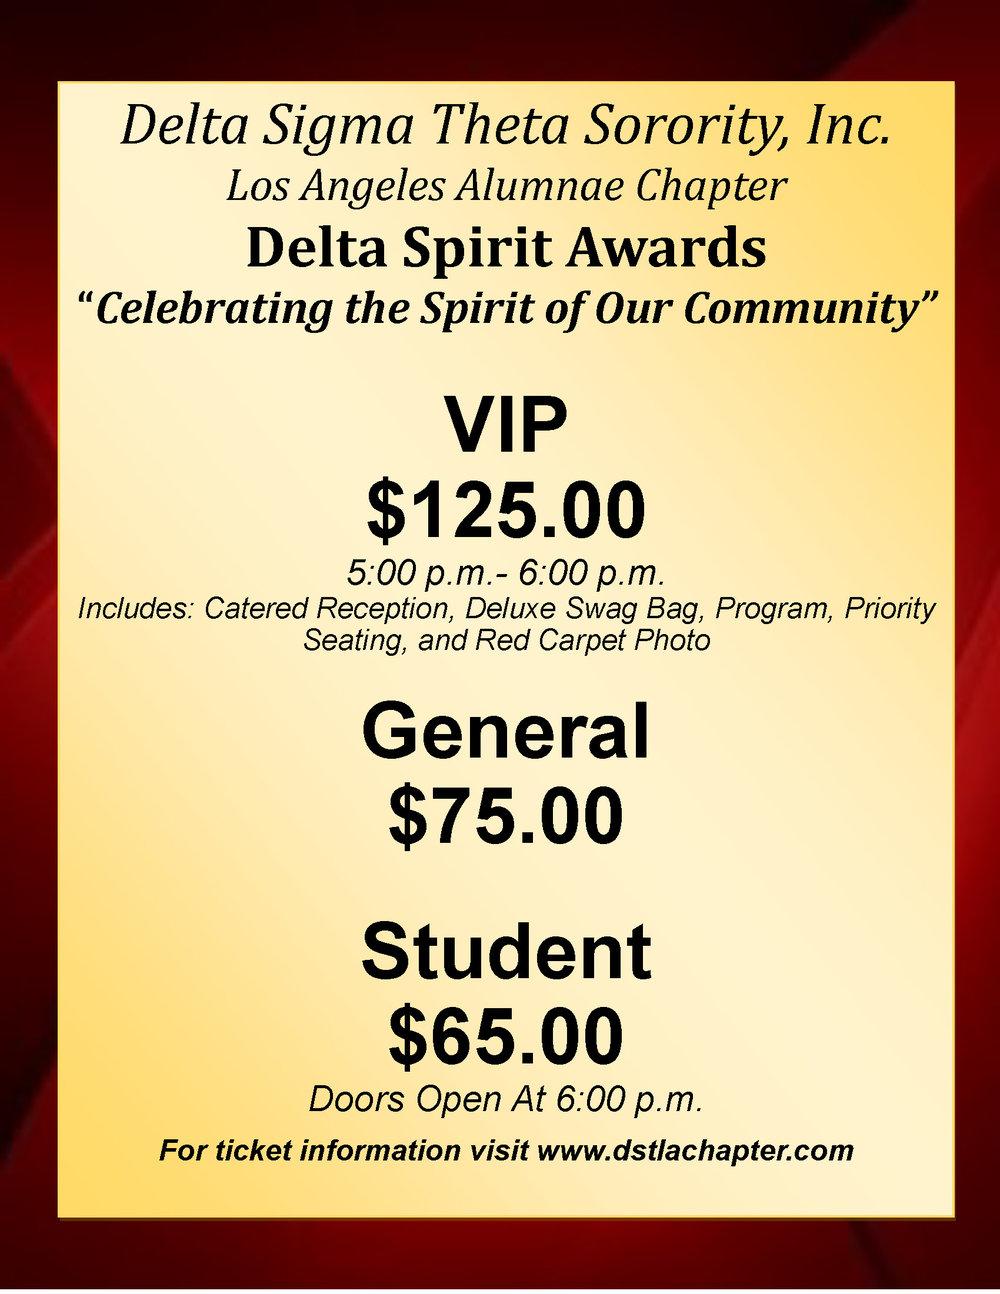 Delta Sigma Theta 2018 Promotional Flyer (1) (1).jpg